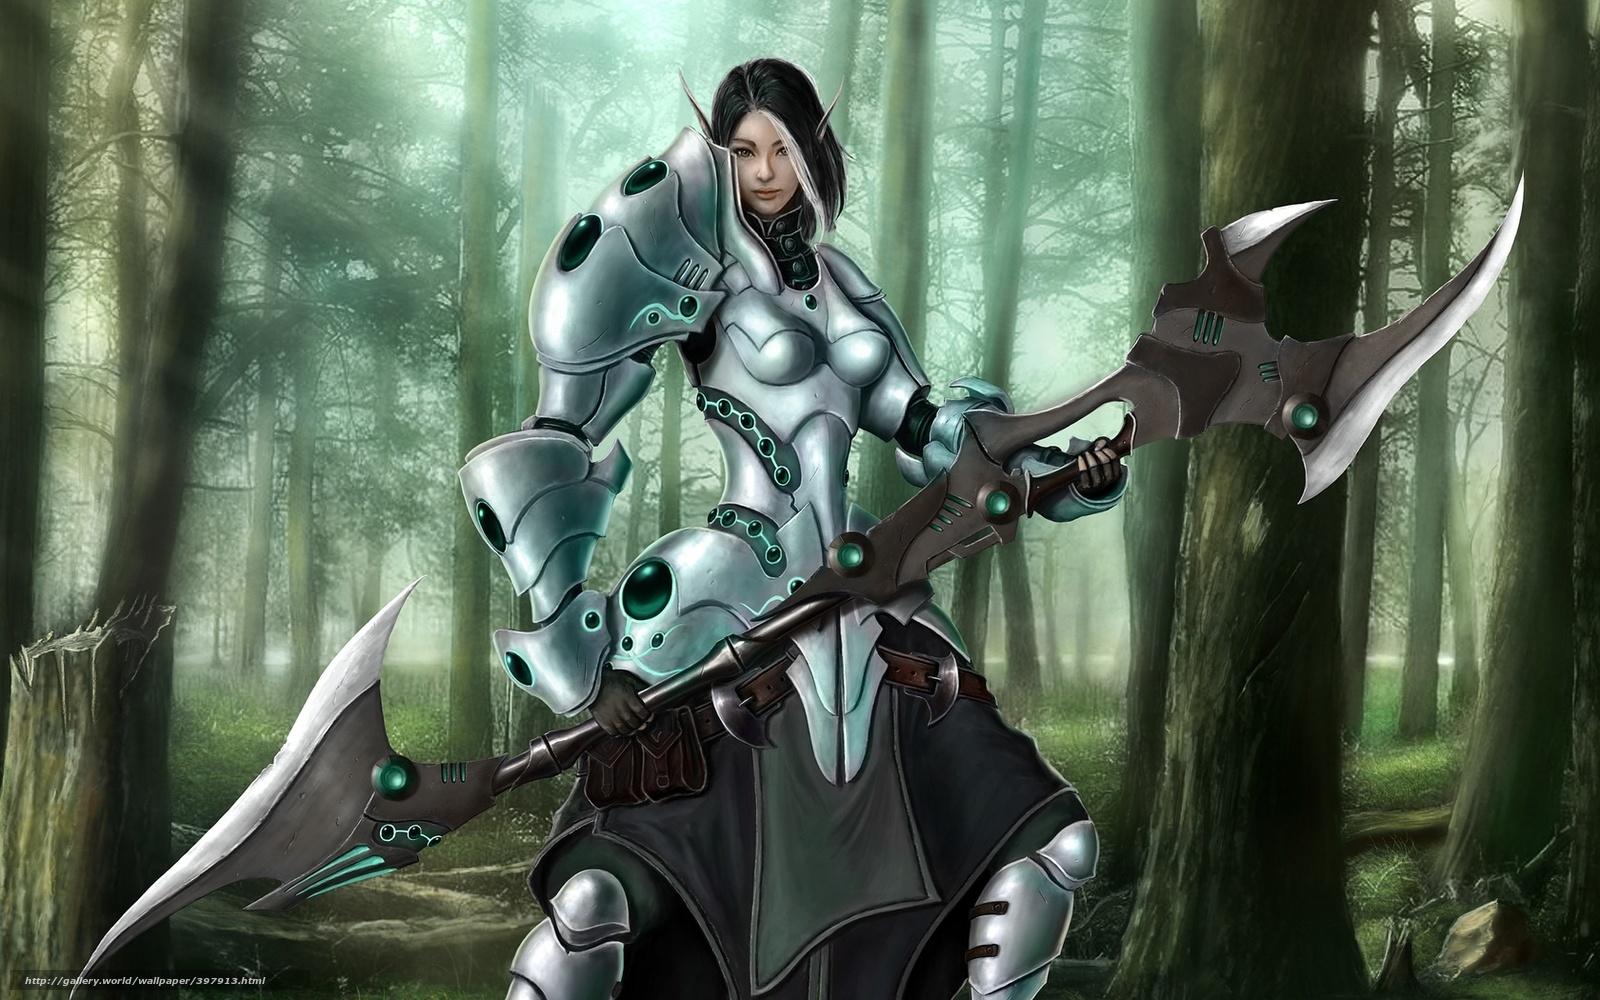 Anime elf female warrior images hentai submissive models